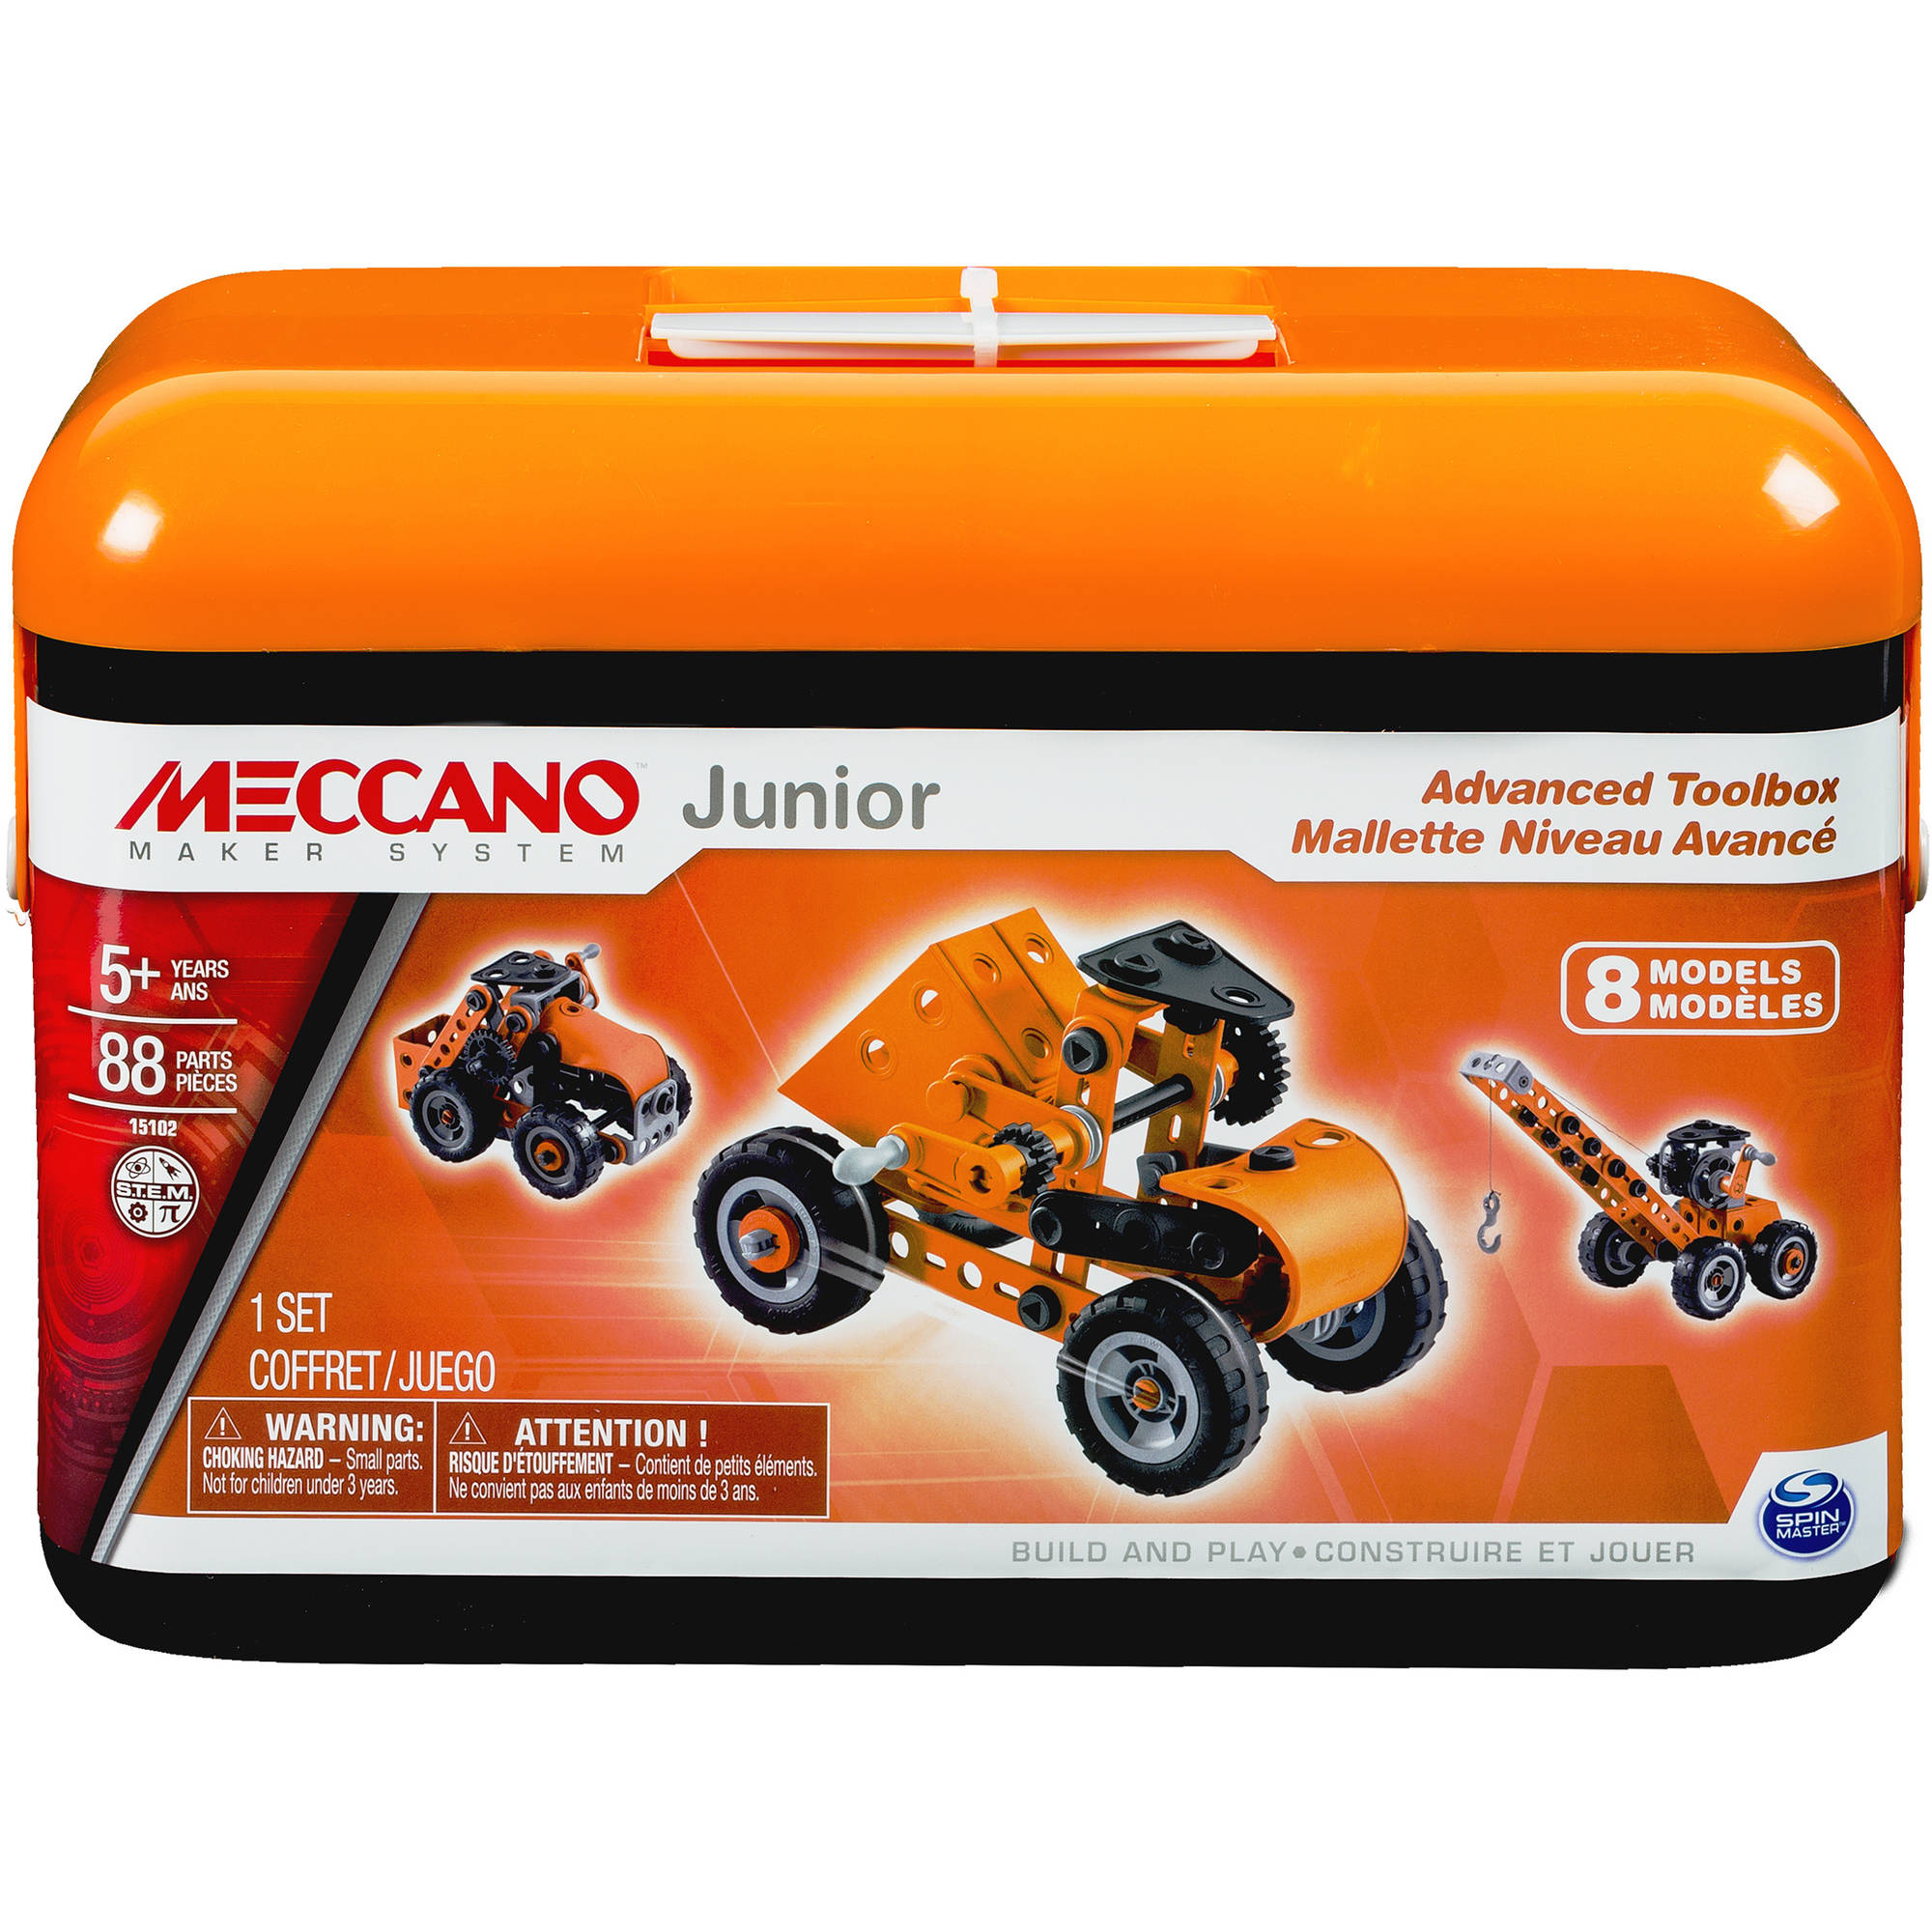 Meccano Junior Advanced Toolbox, 8 Model Kit